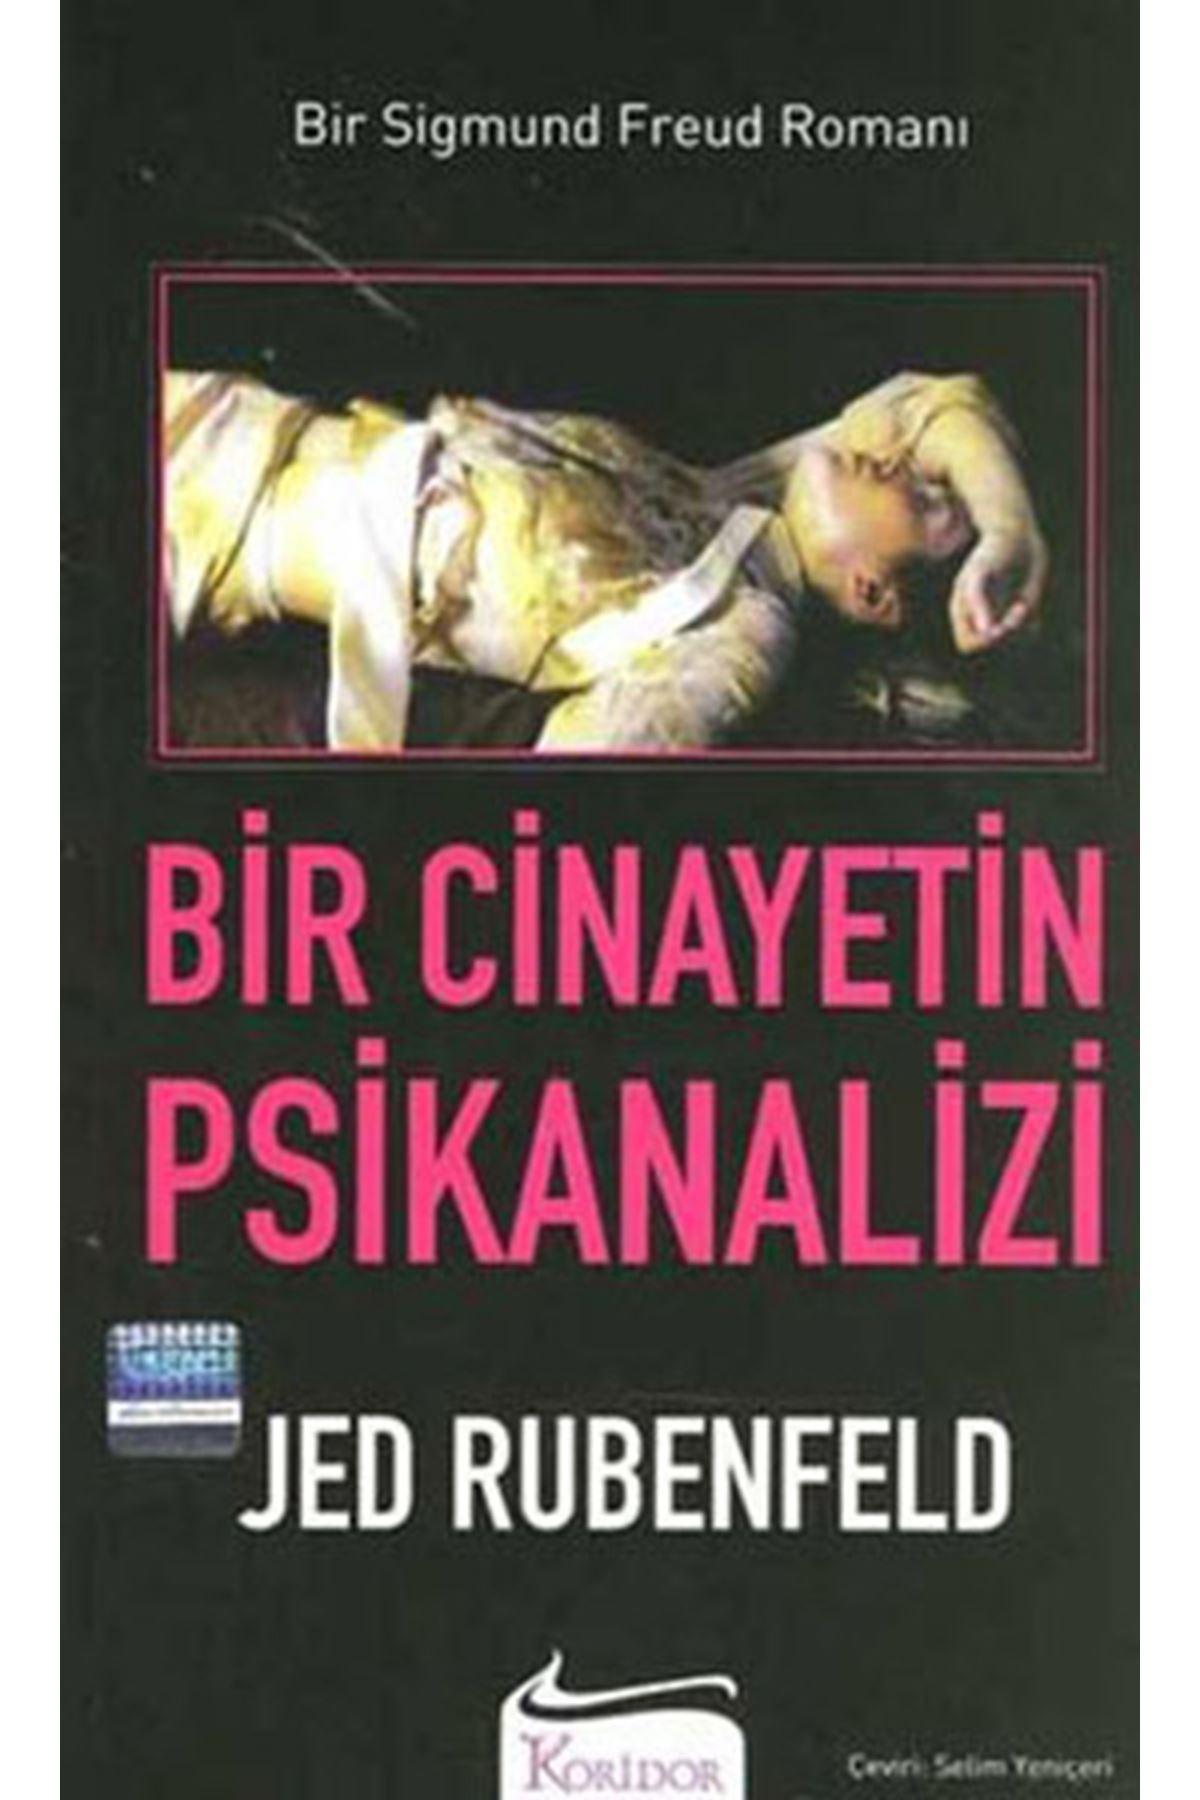 JED RBENFELD - BİR CİNAYETİN PSİKANALİZİ